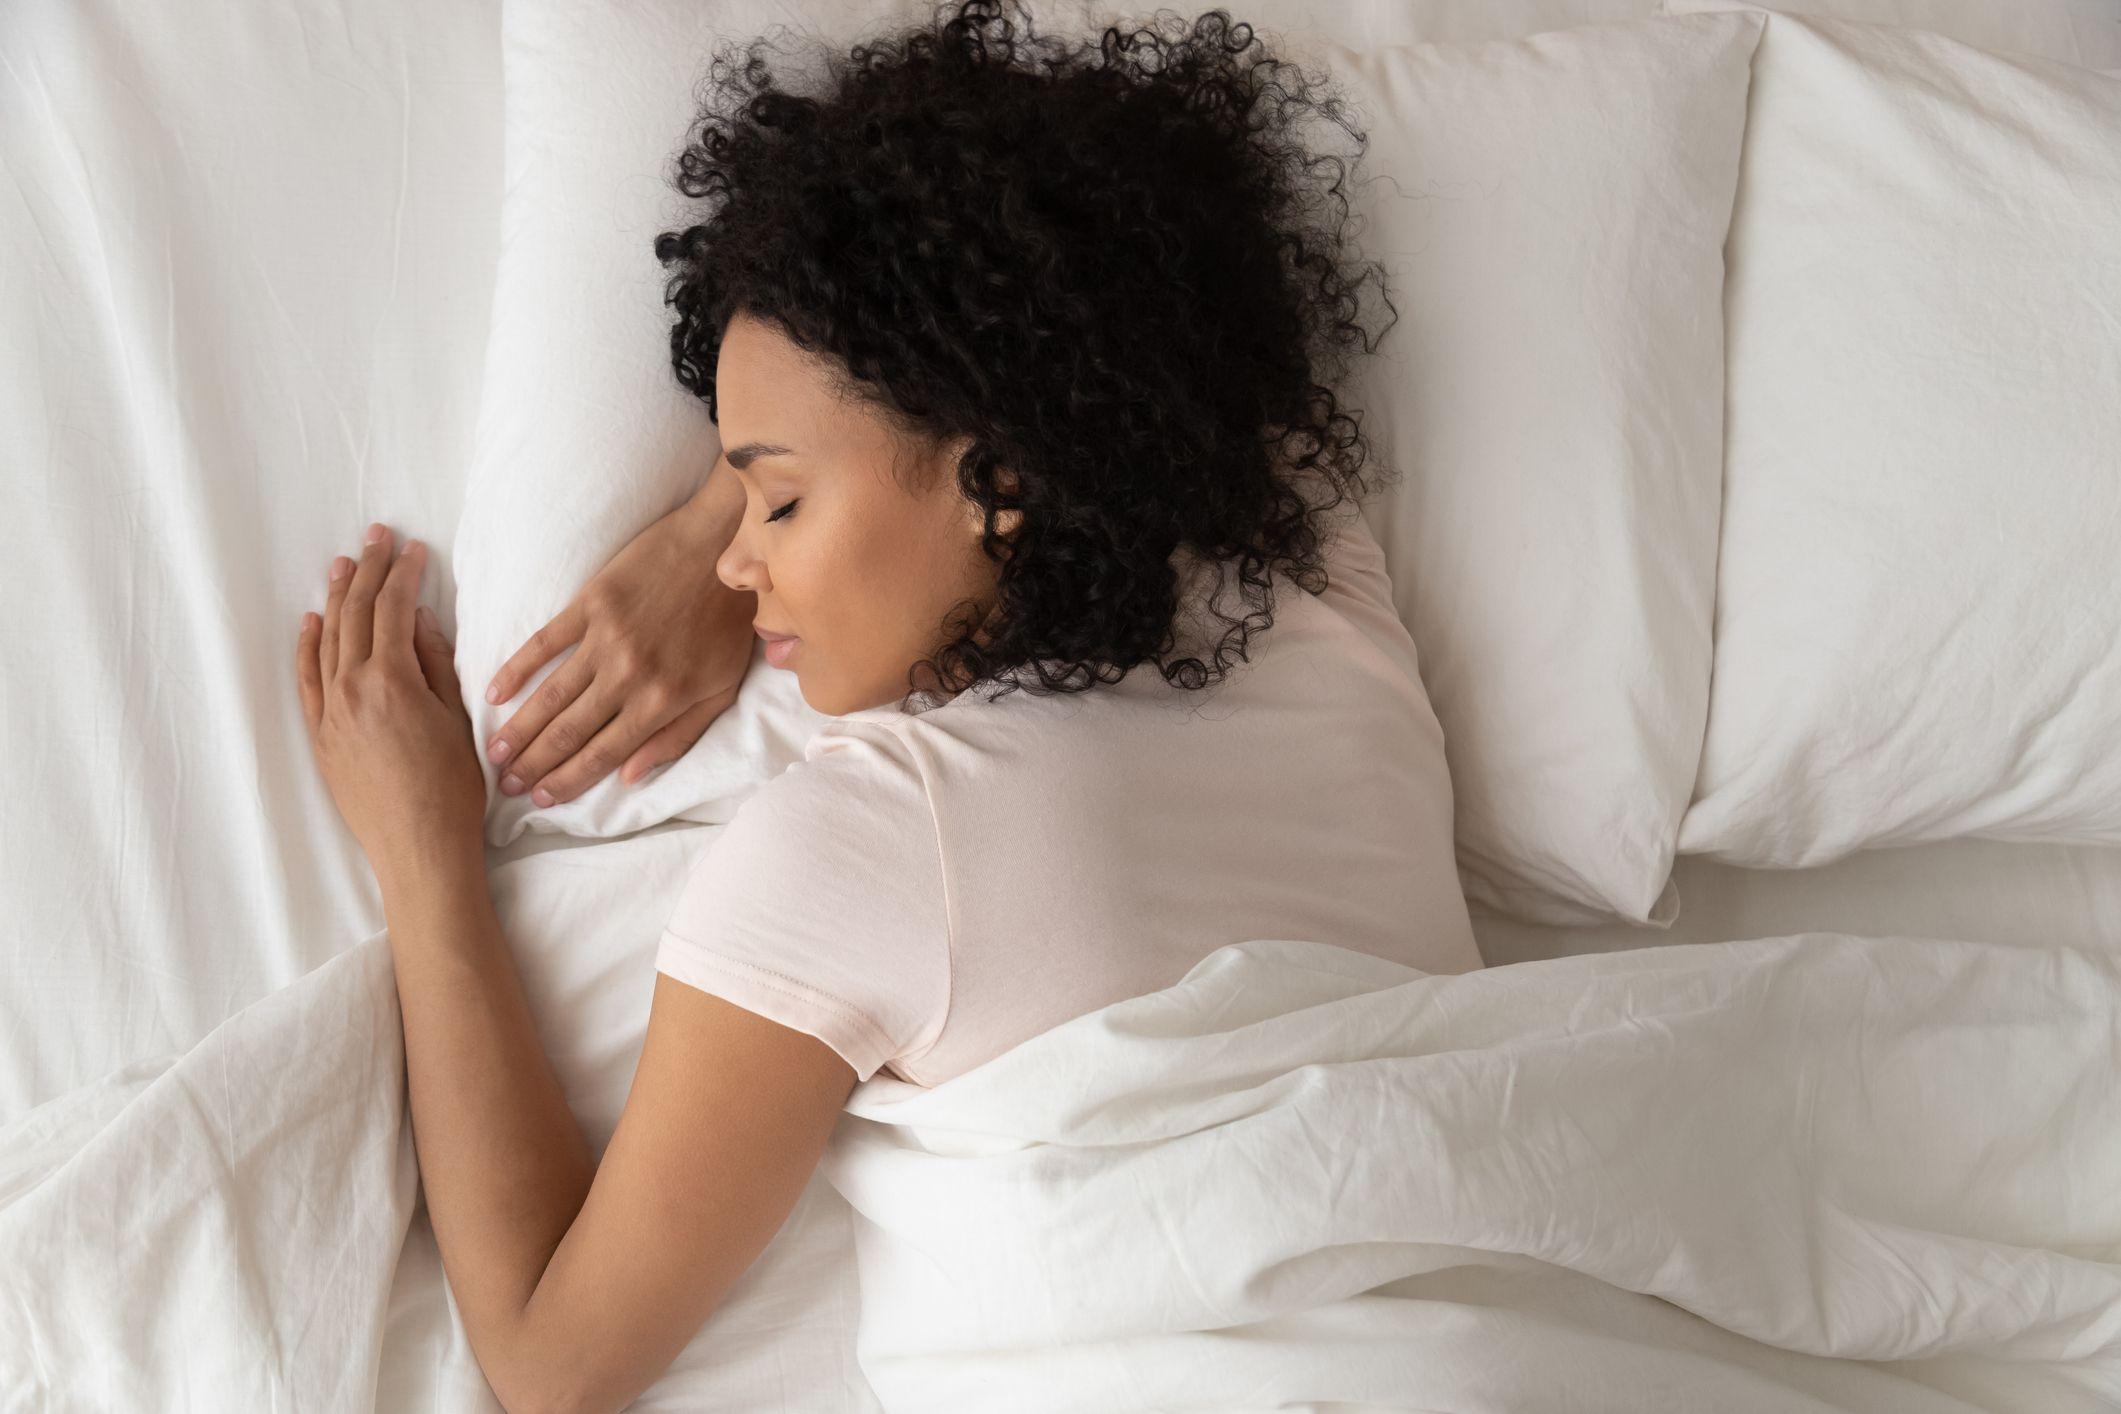 Healthy serene african girl sleeping in comfortable bed, top view